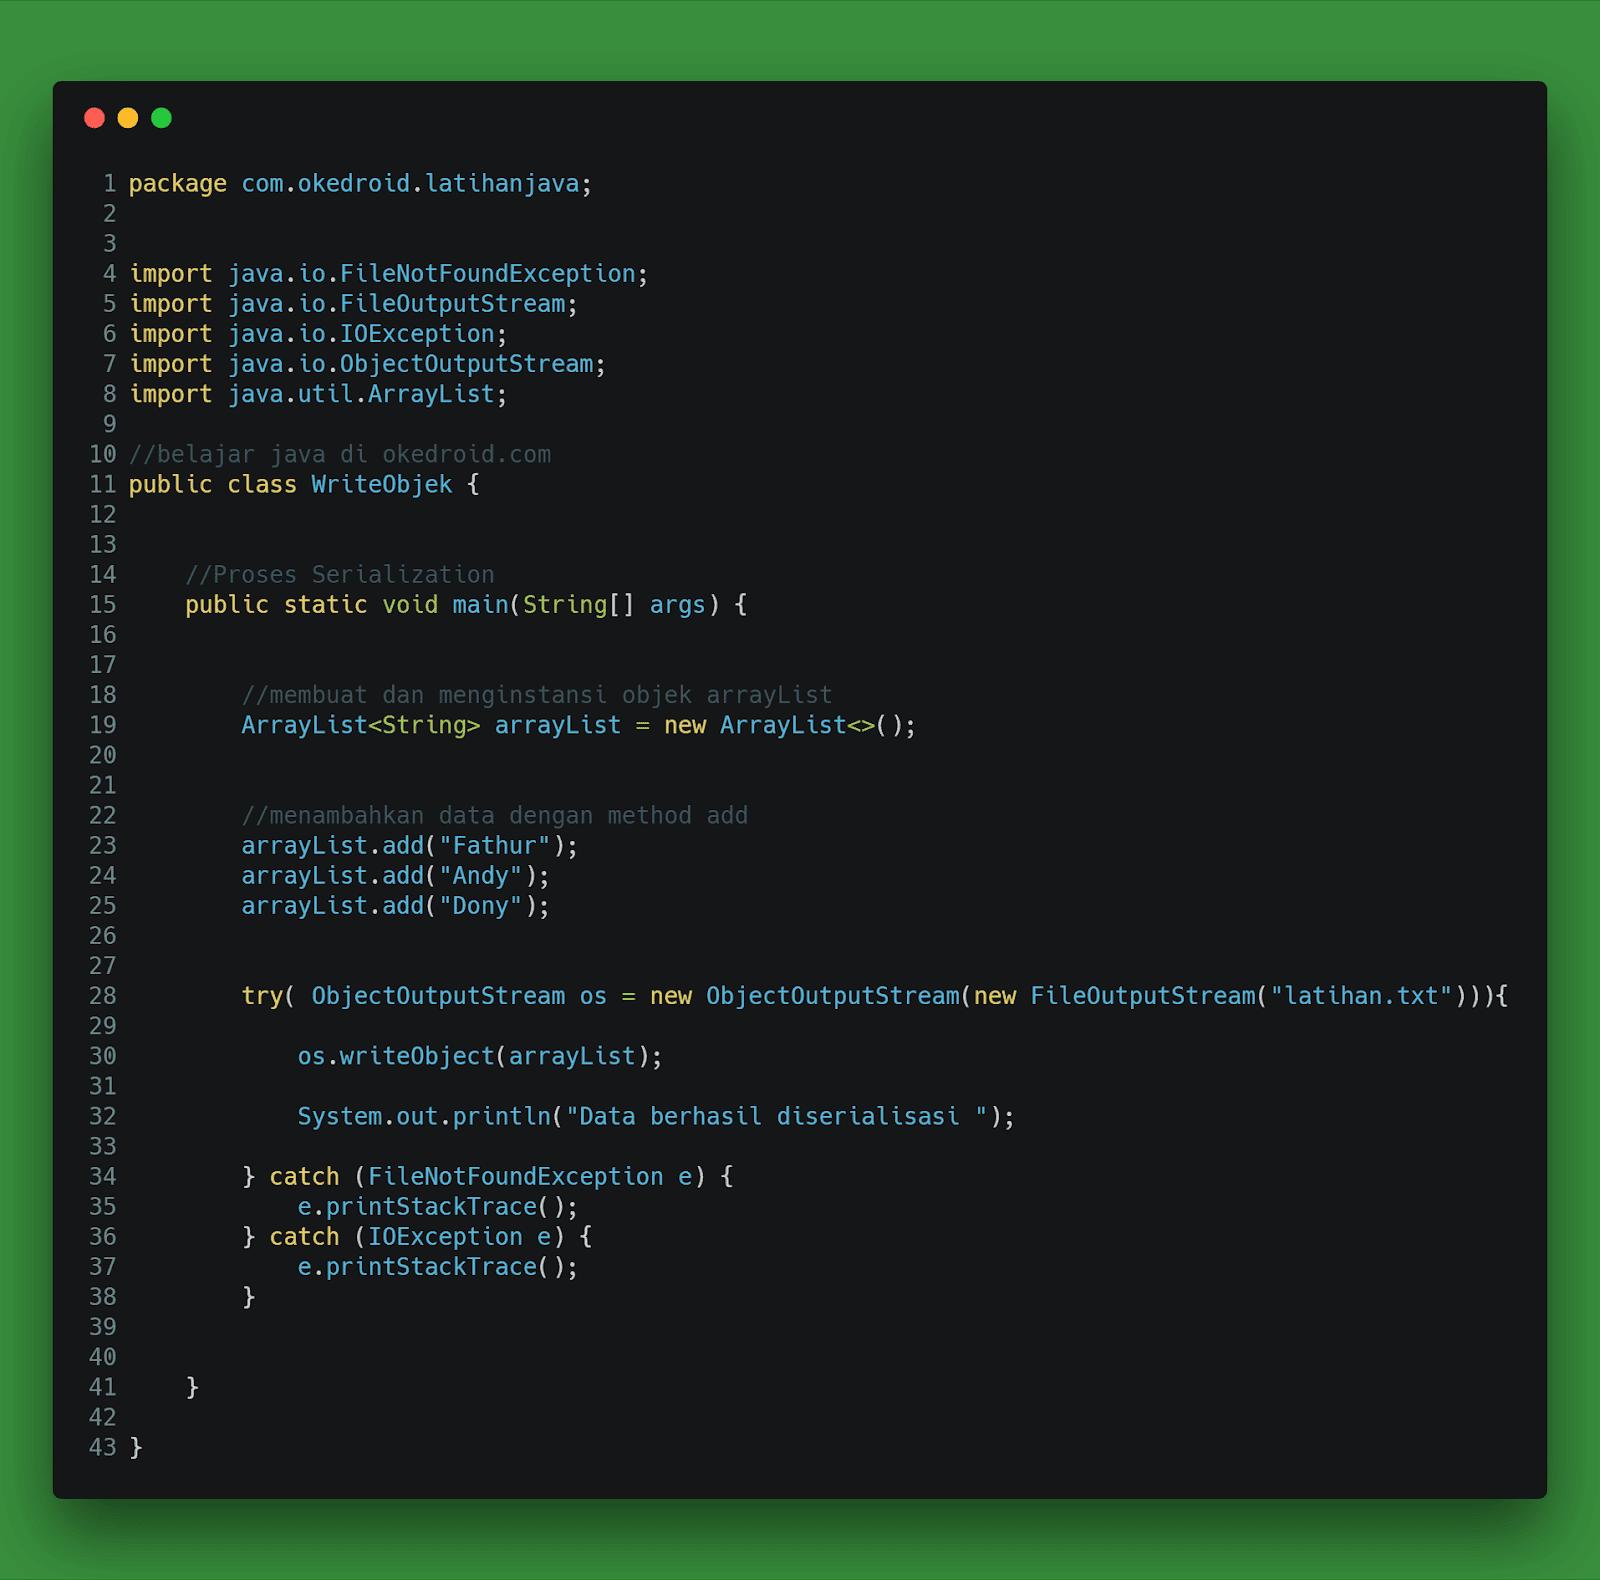 Contoh Code fungsi program  Proses Serialization serialisasi arraylist di java